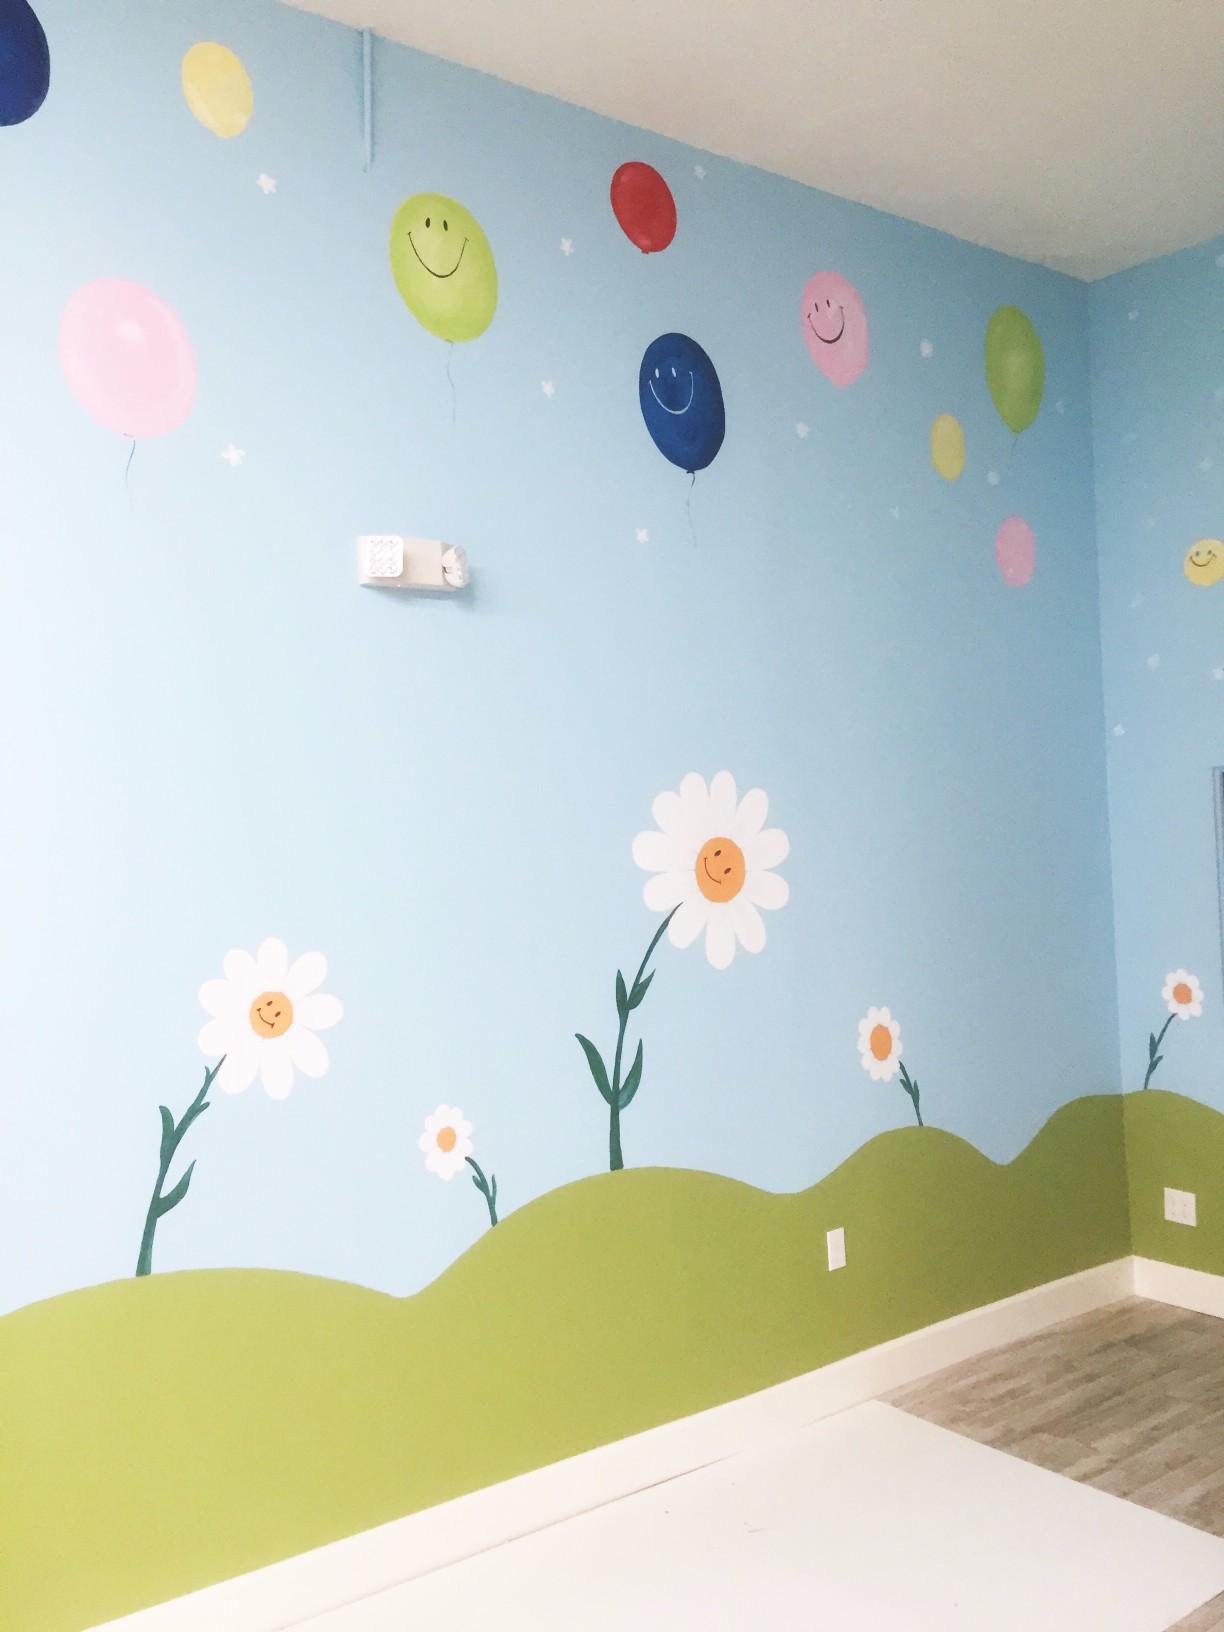 Childrens Bedroom Mural Artist Laroyalart 2